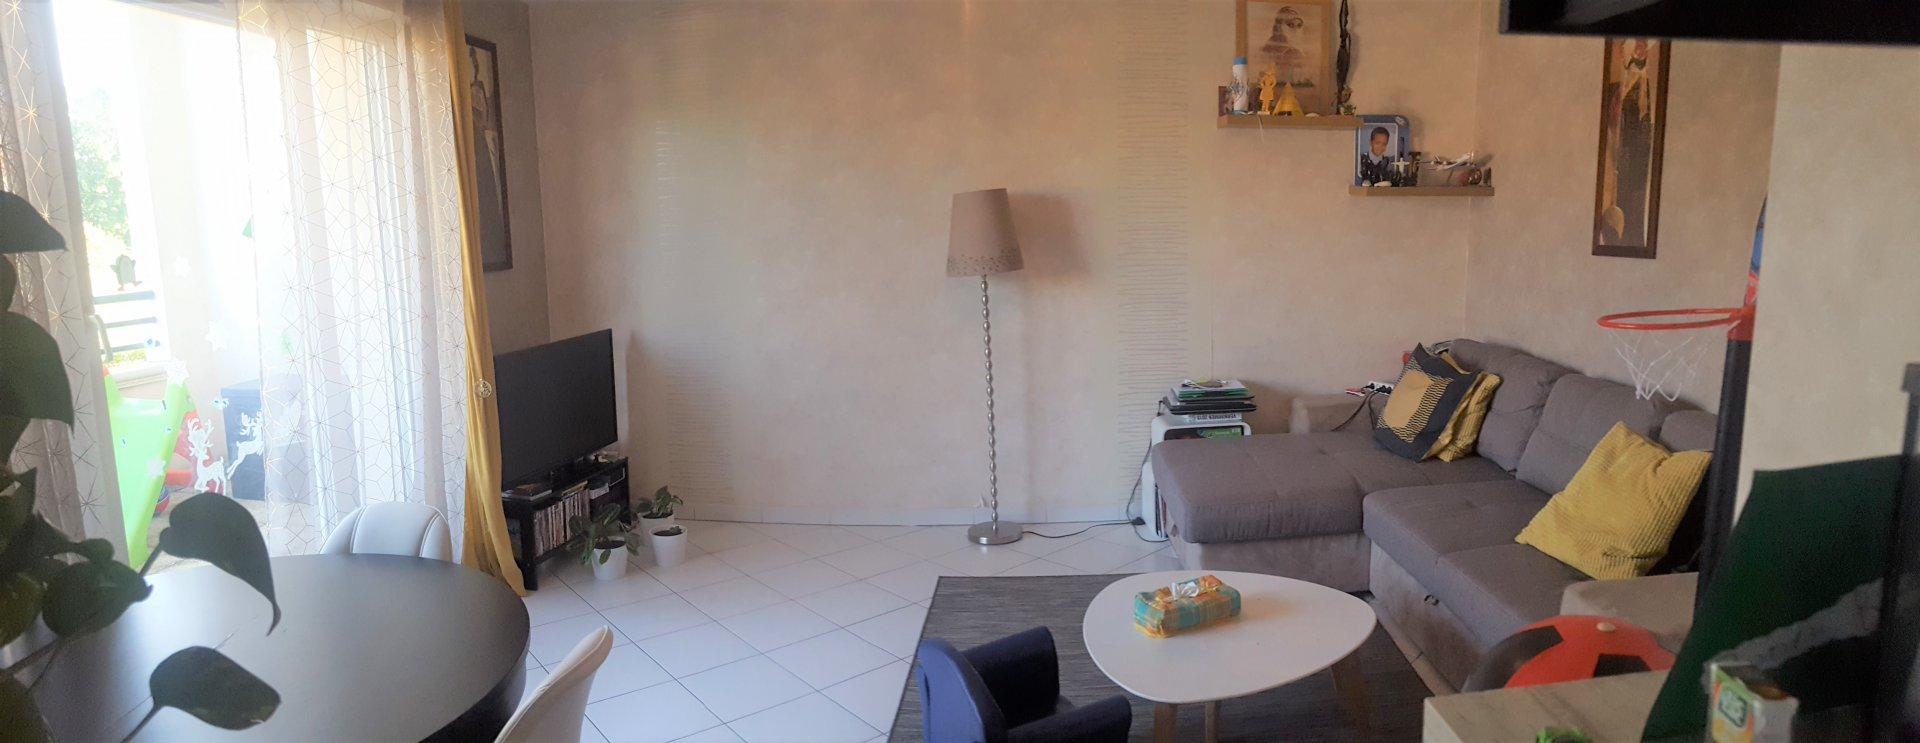 F3 58.50 m² avec terrasse et box